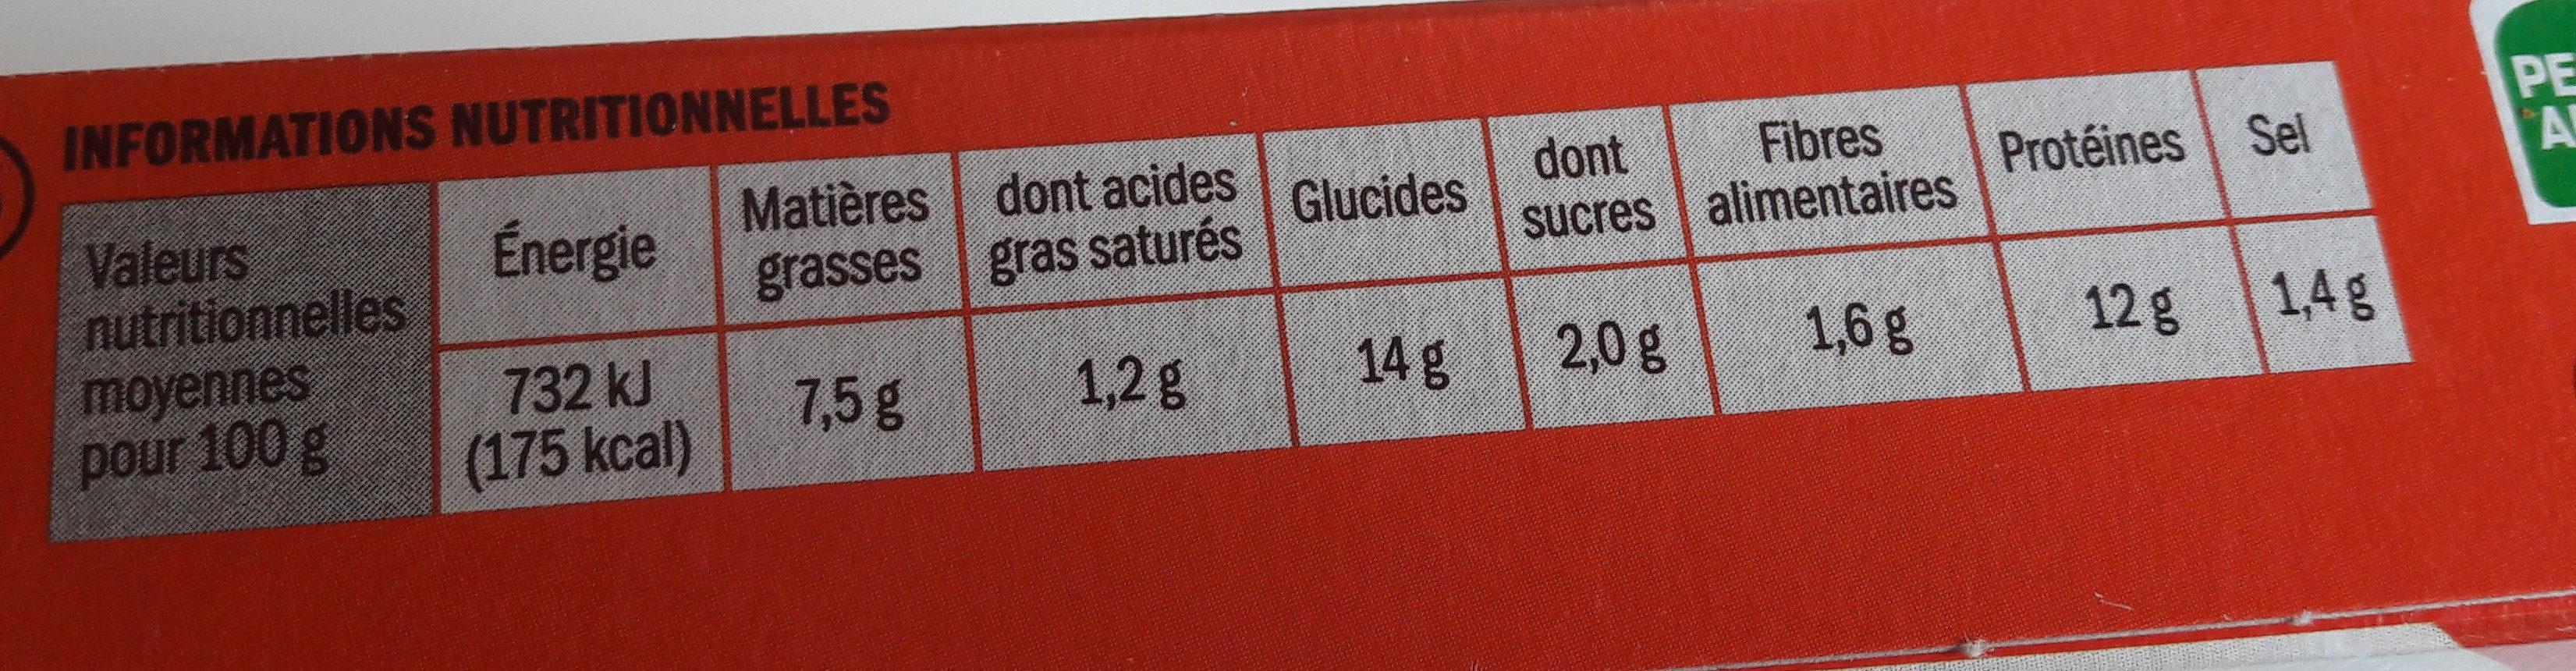 Escalopes bolognaise x 2 - Nutrition facts